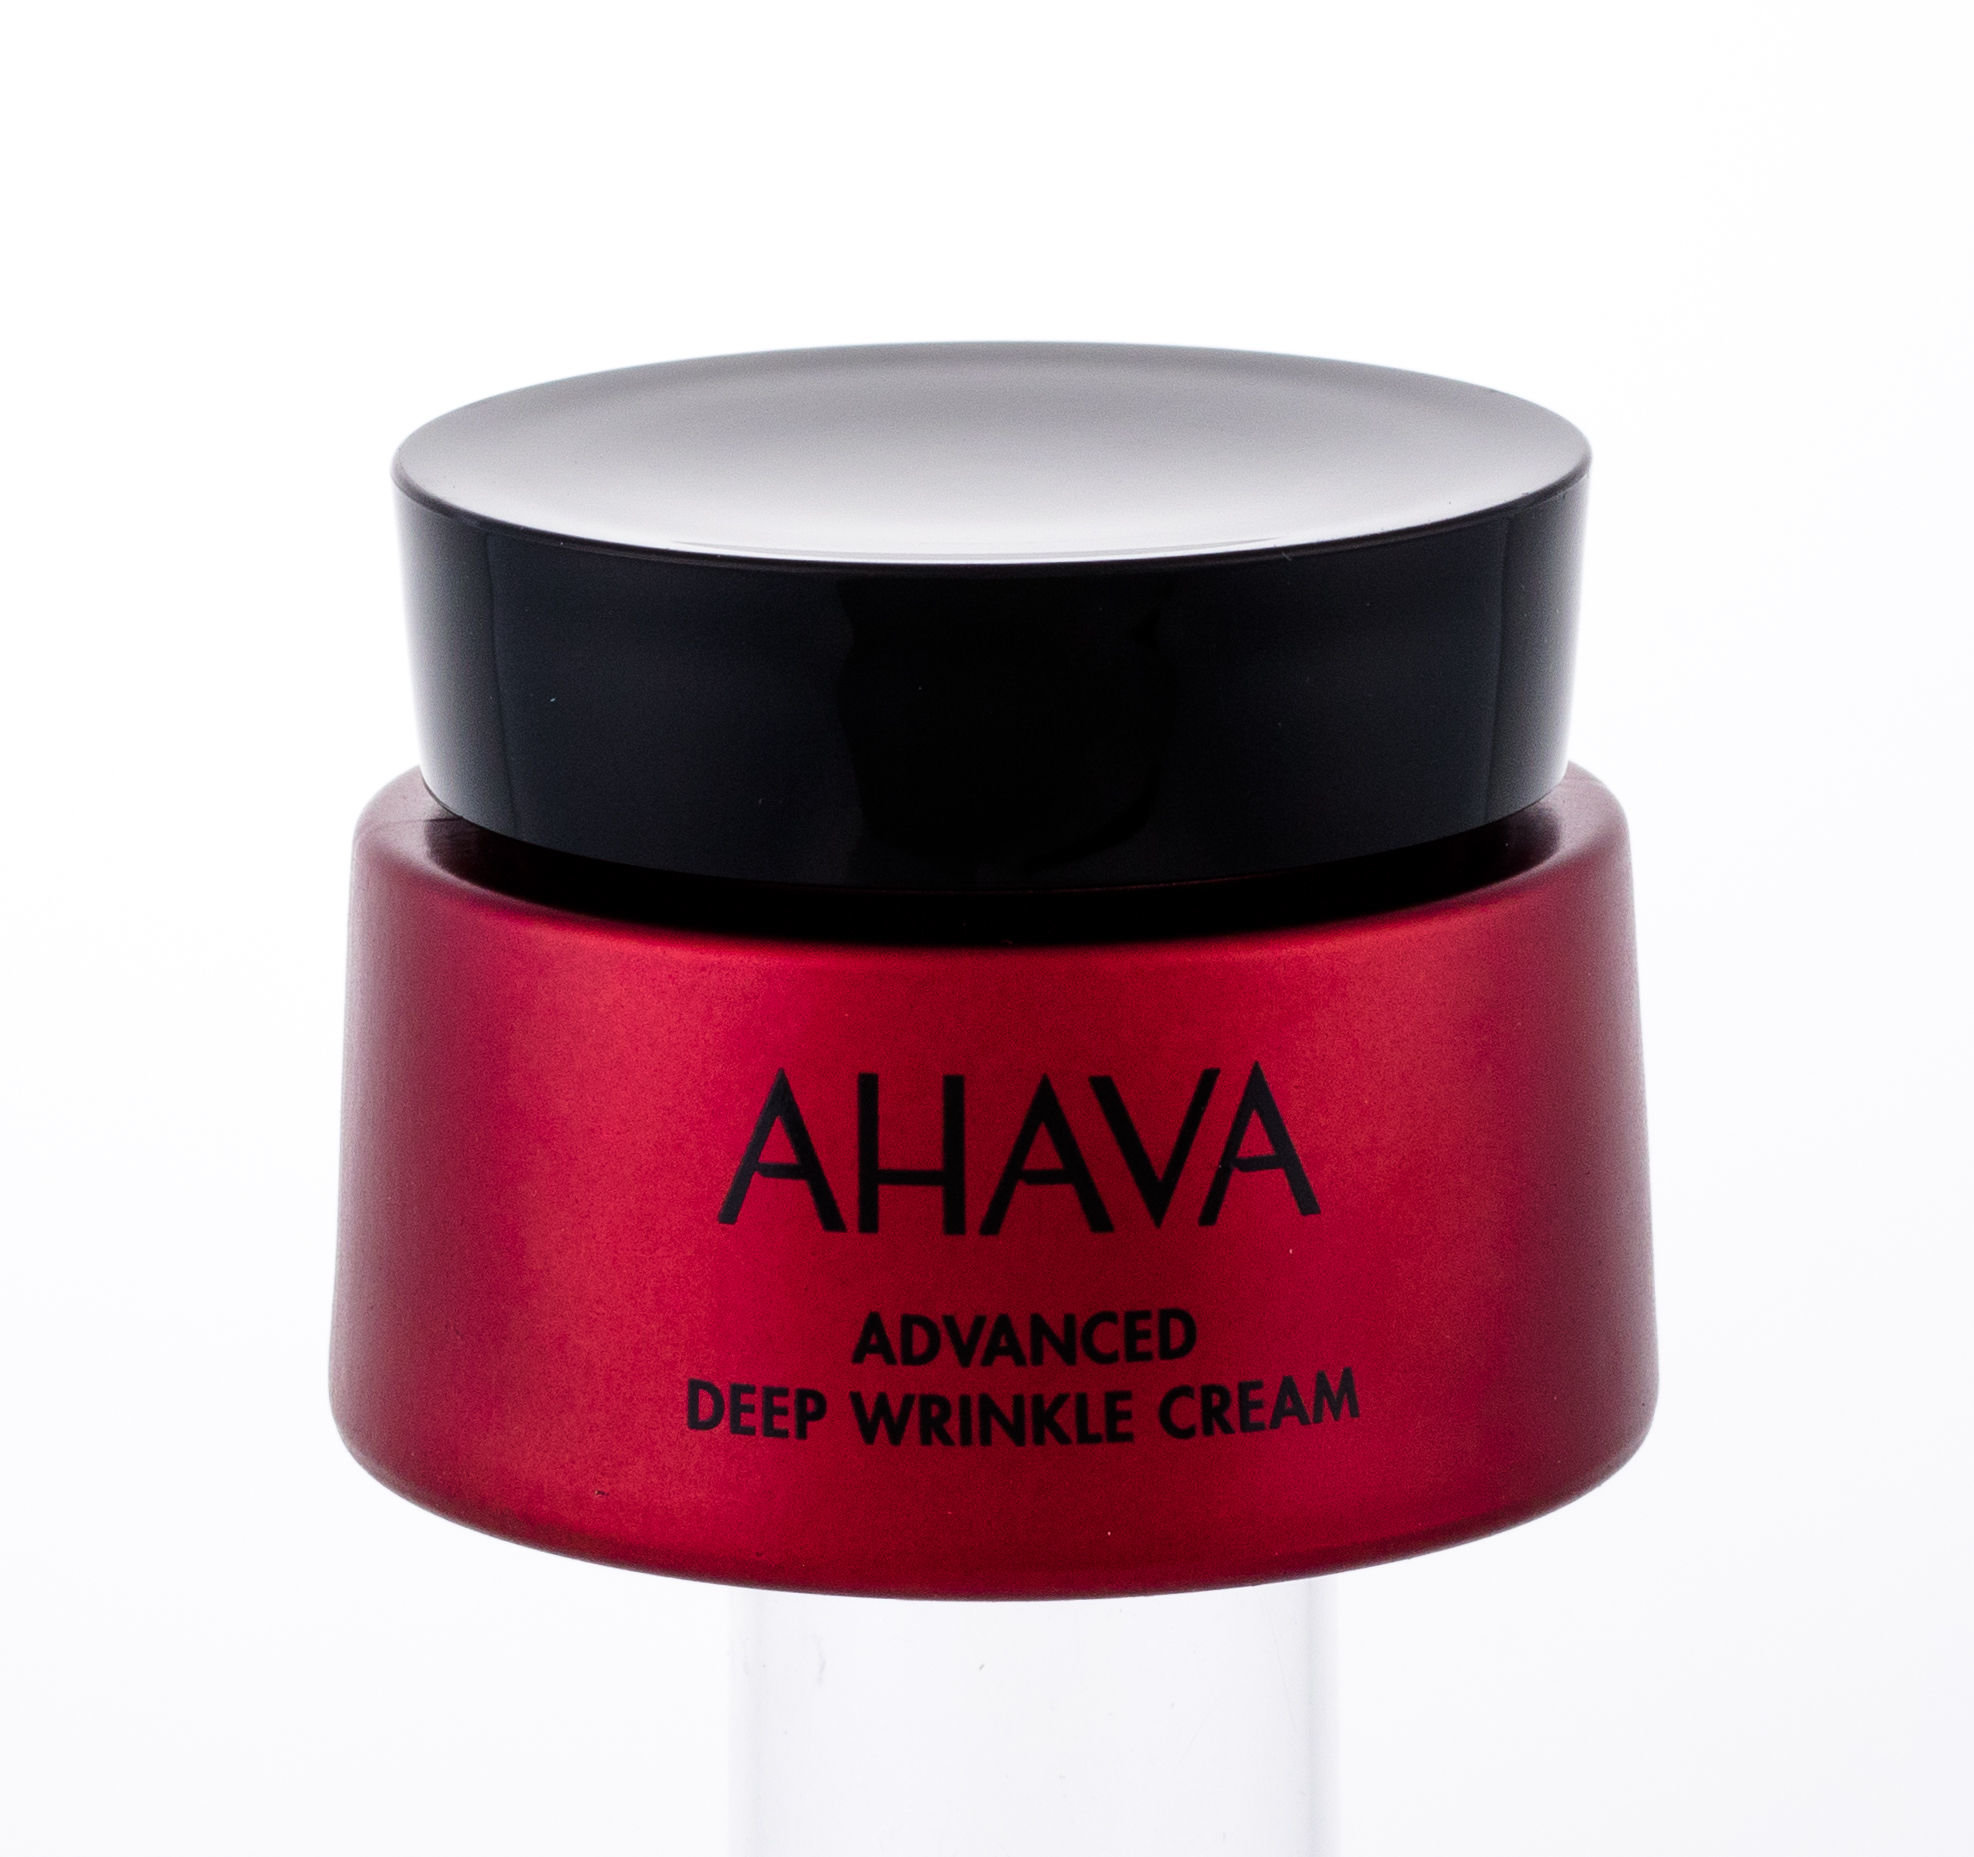 AHAVA Apple Of Sodom Day Cream 50ml  Advanced Deep Wrinkle Cream